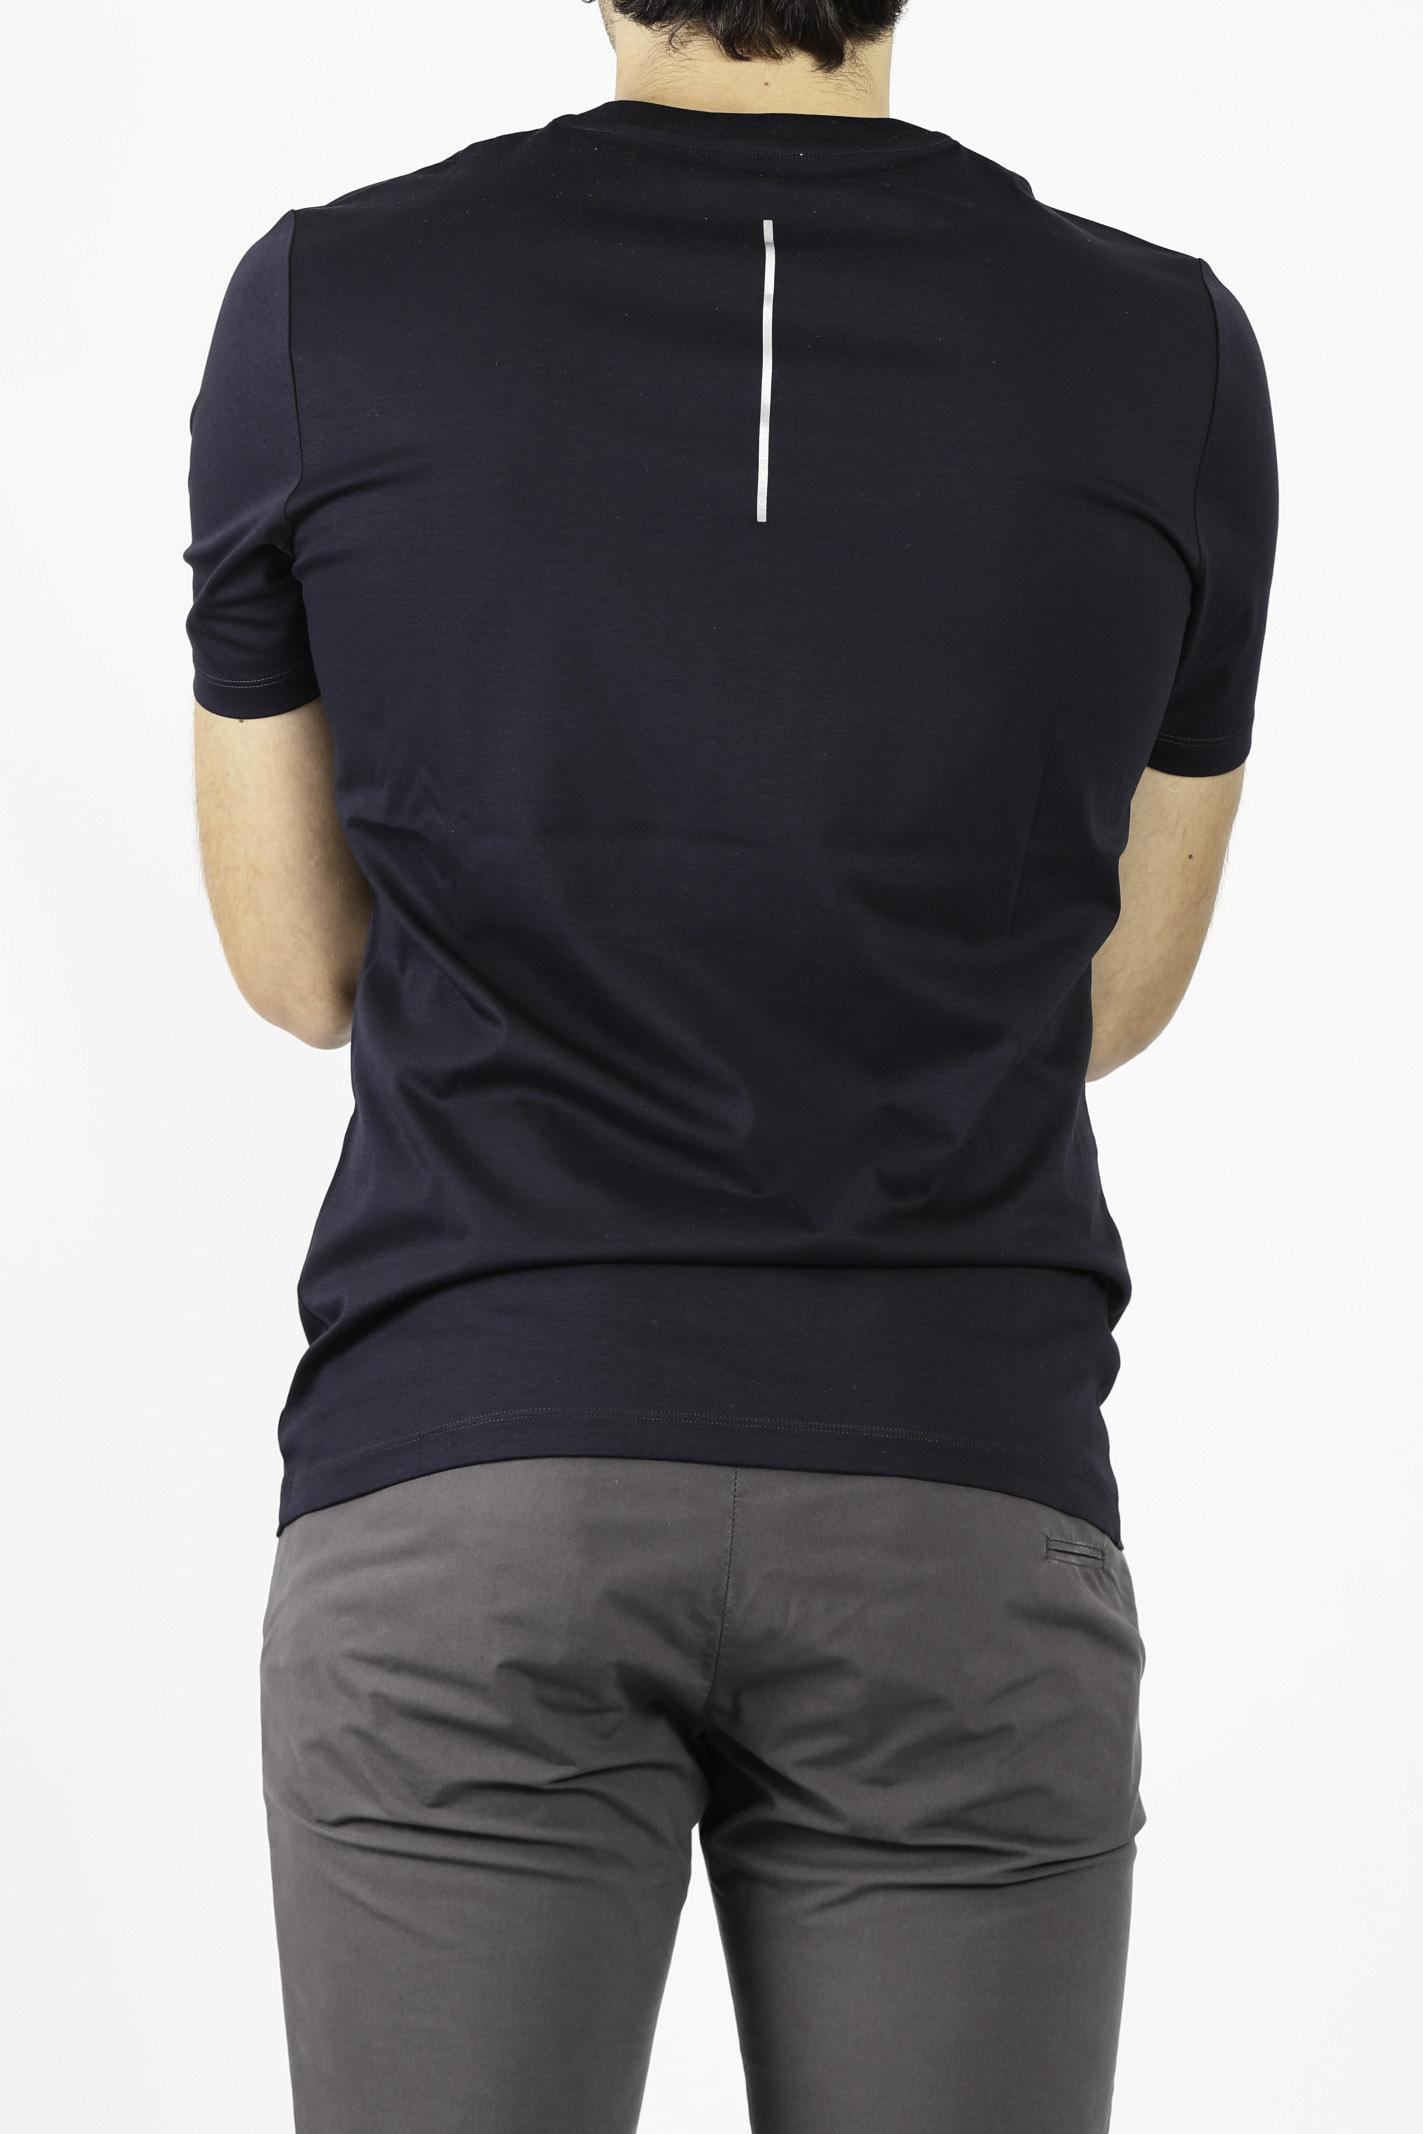 COTTON T-SHIRT PEOPLE OF SHIBUYA | T-shirt | SHIKO-PM444780